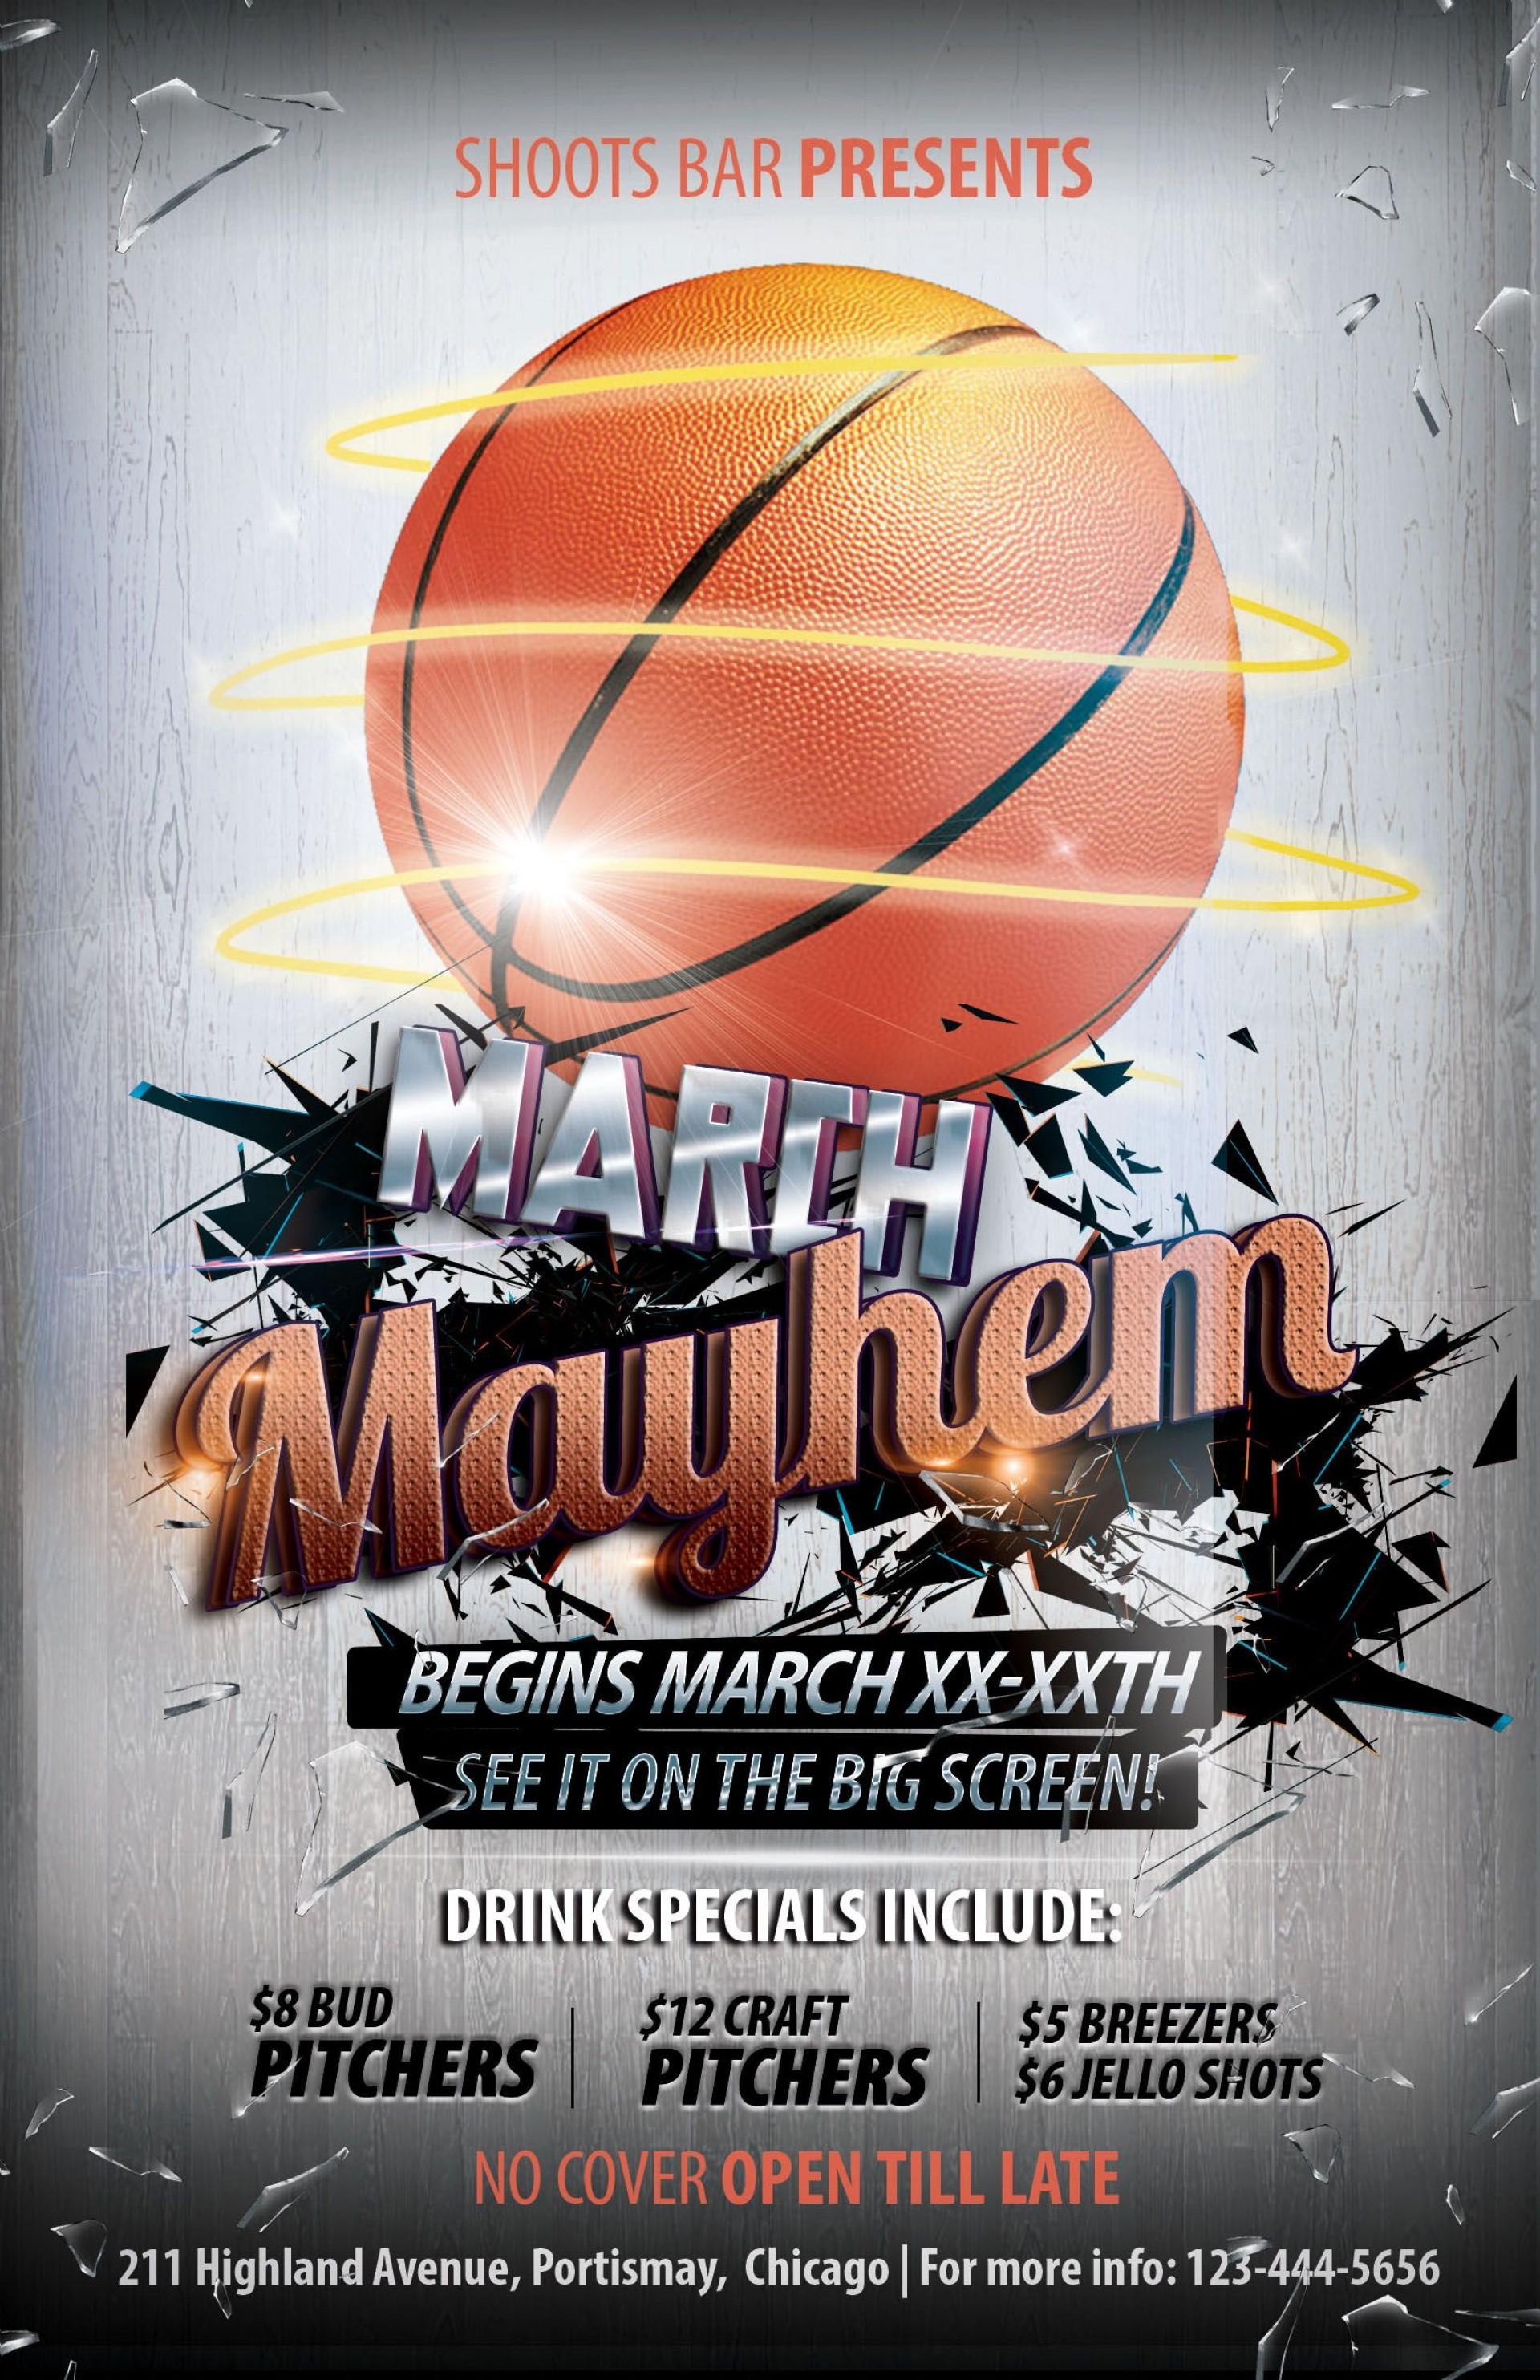 003 Rare Basketball Tournament Flyer Template Design  3 On Free1920